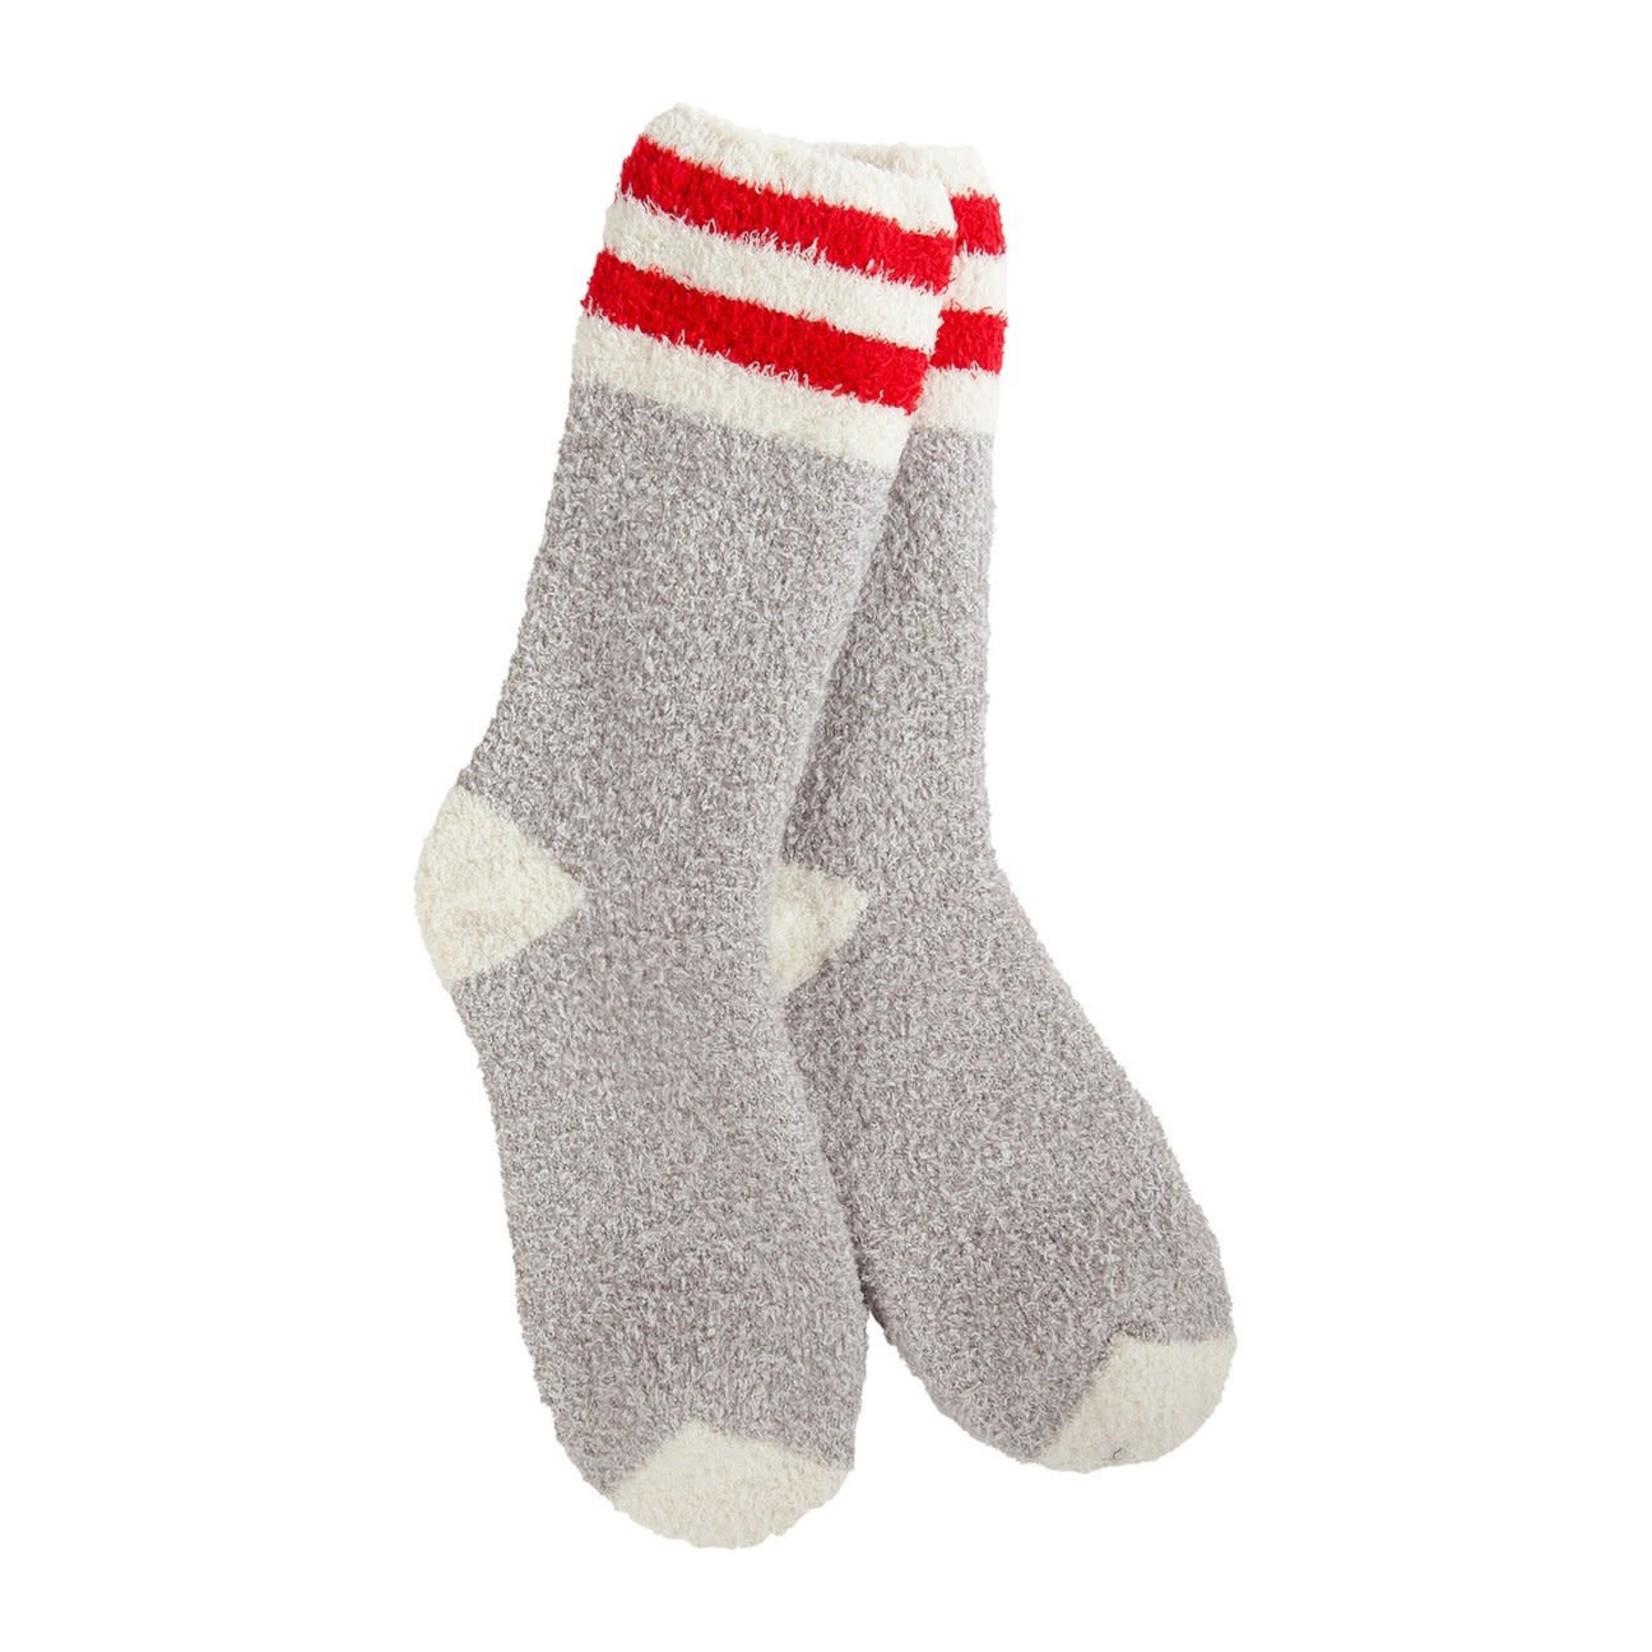 World's Softest Knit Pickin' Fireside Crew Socks- Rugby